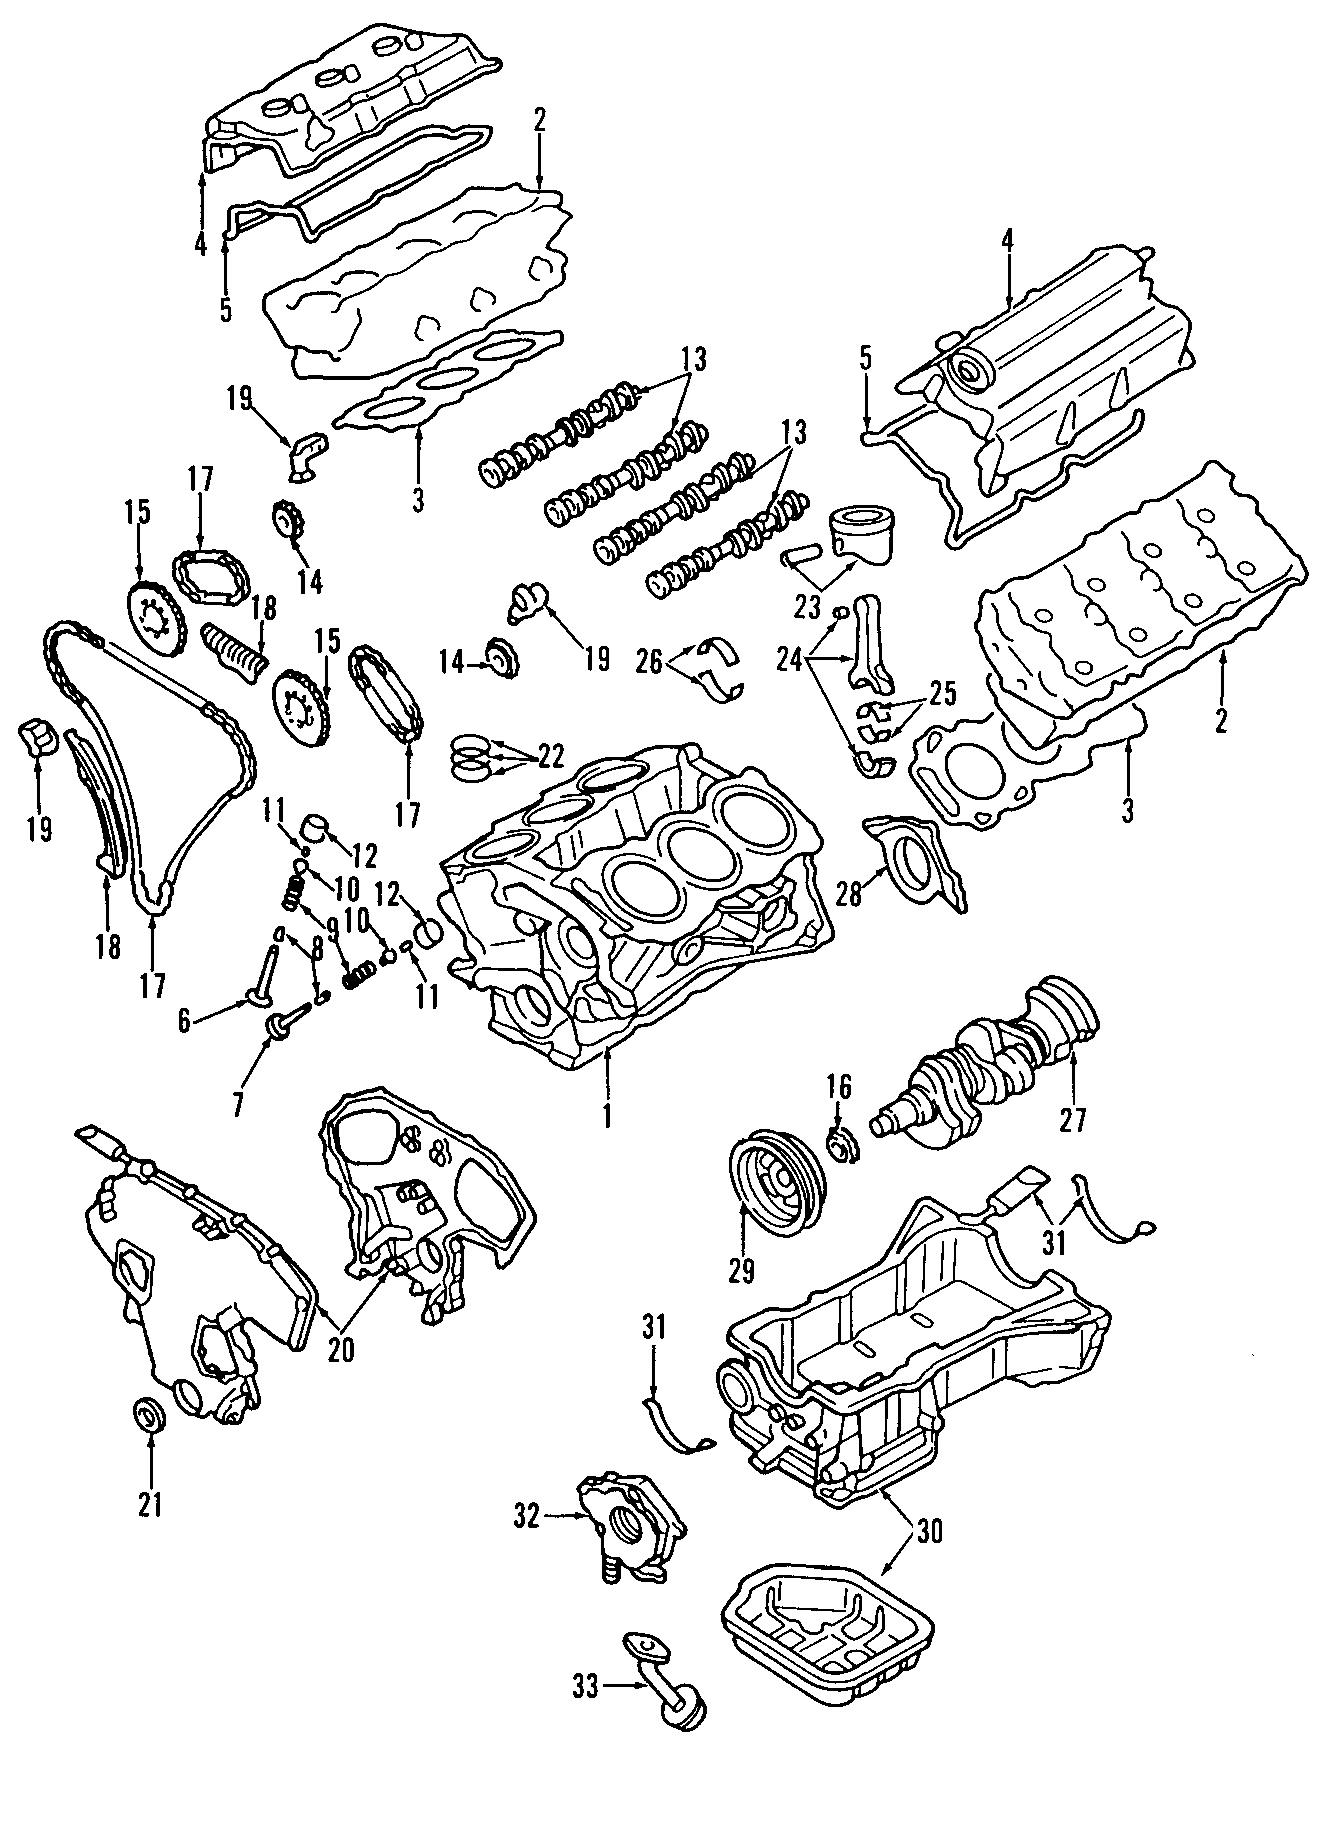 Nissan Altima Mount. INSULATOR. Transmission. ENGINE